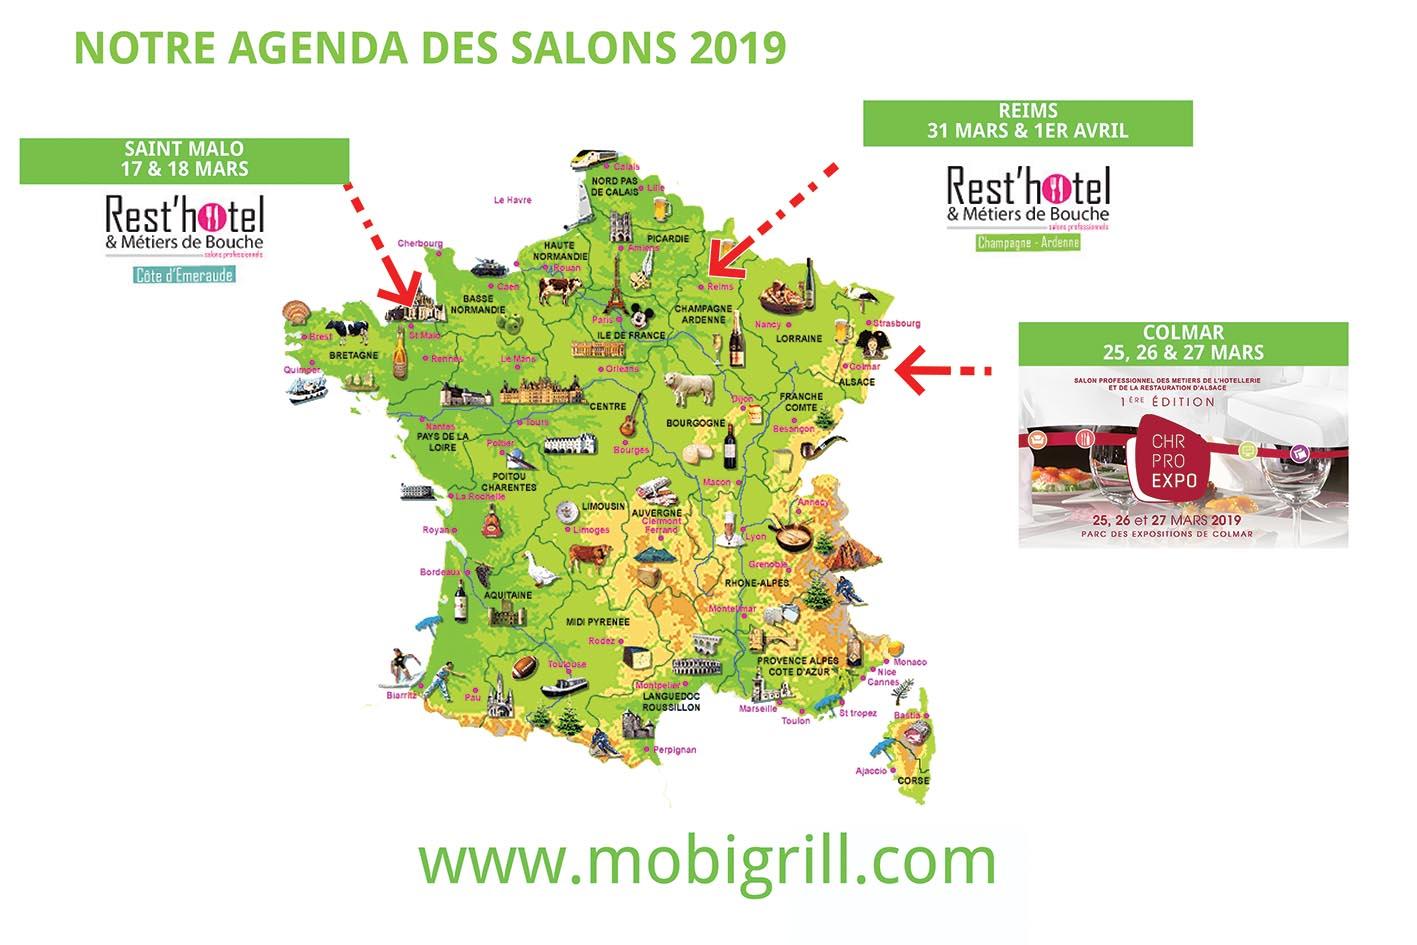 carte salons 2019 - mobigrill